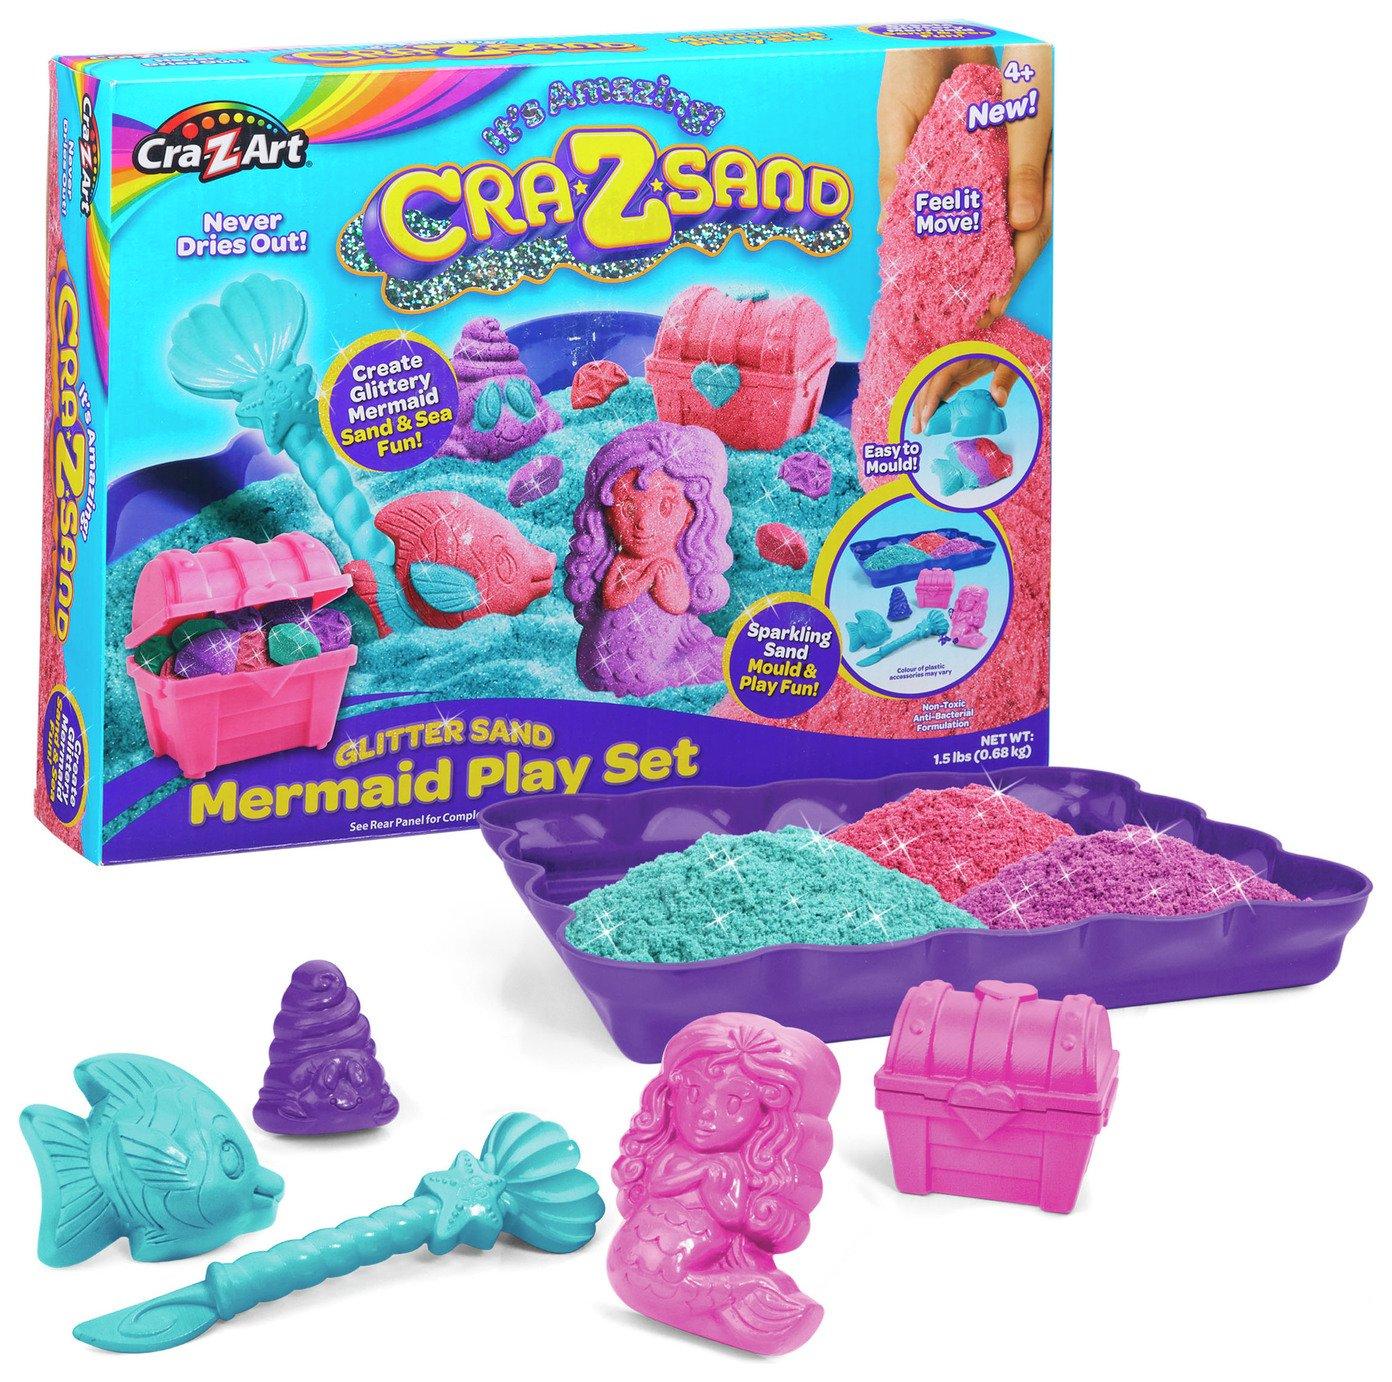 Cra-Z-Sand Mermaid Playset